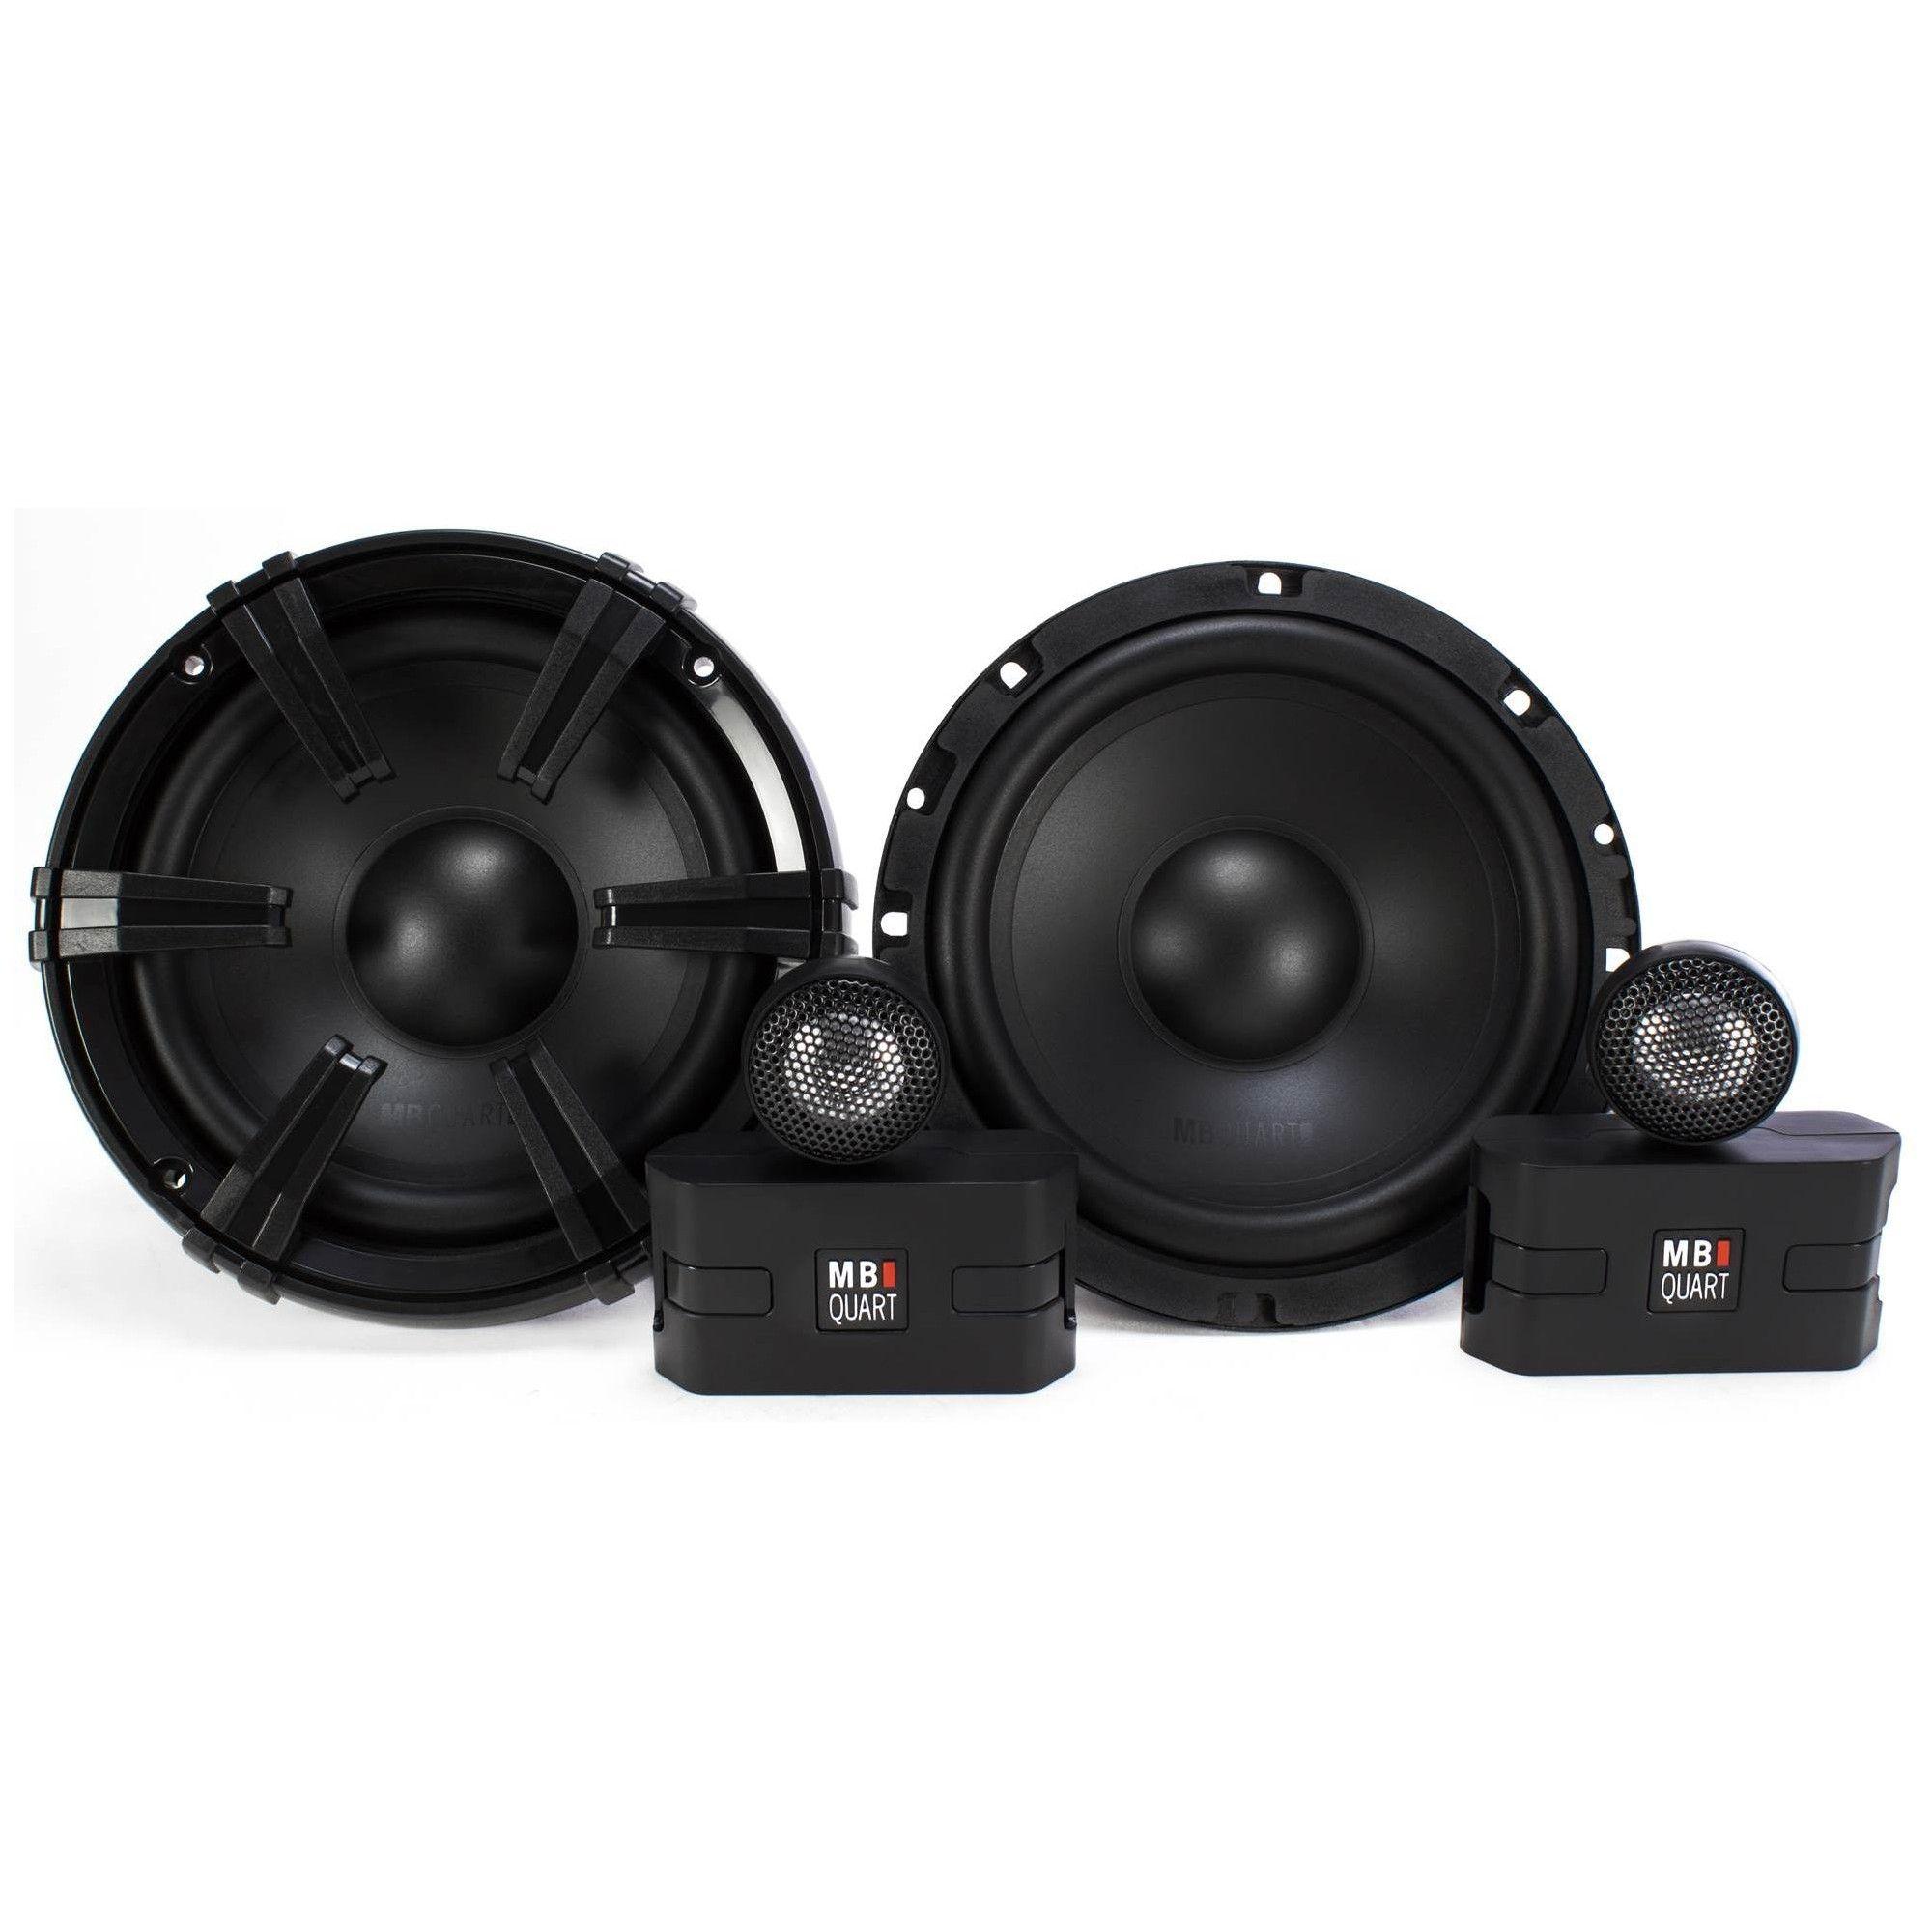 2) MB Quart 6.5 90 Watt Component Speakers Speaker System Set Pair | DC1-216 #componentspeakers